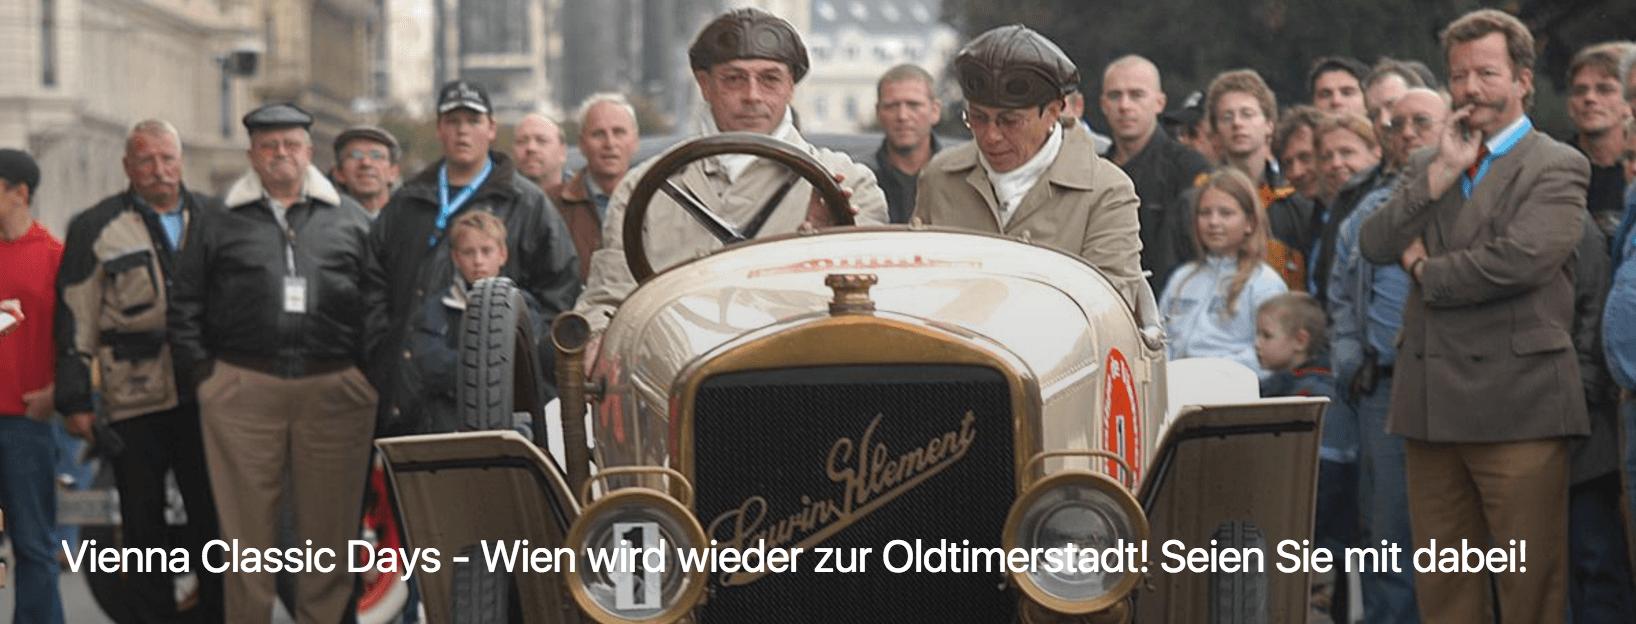 Vienna Classic Days 2017